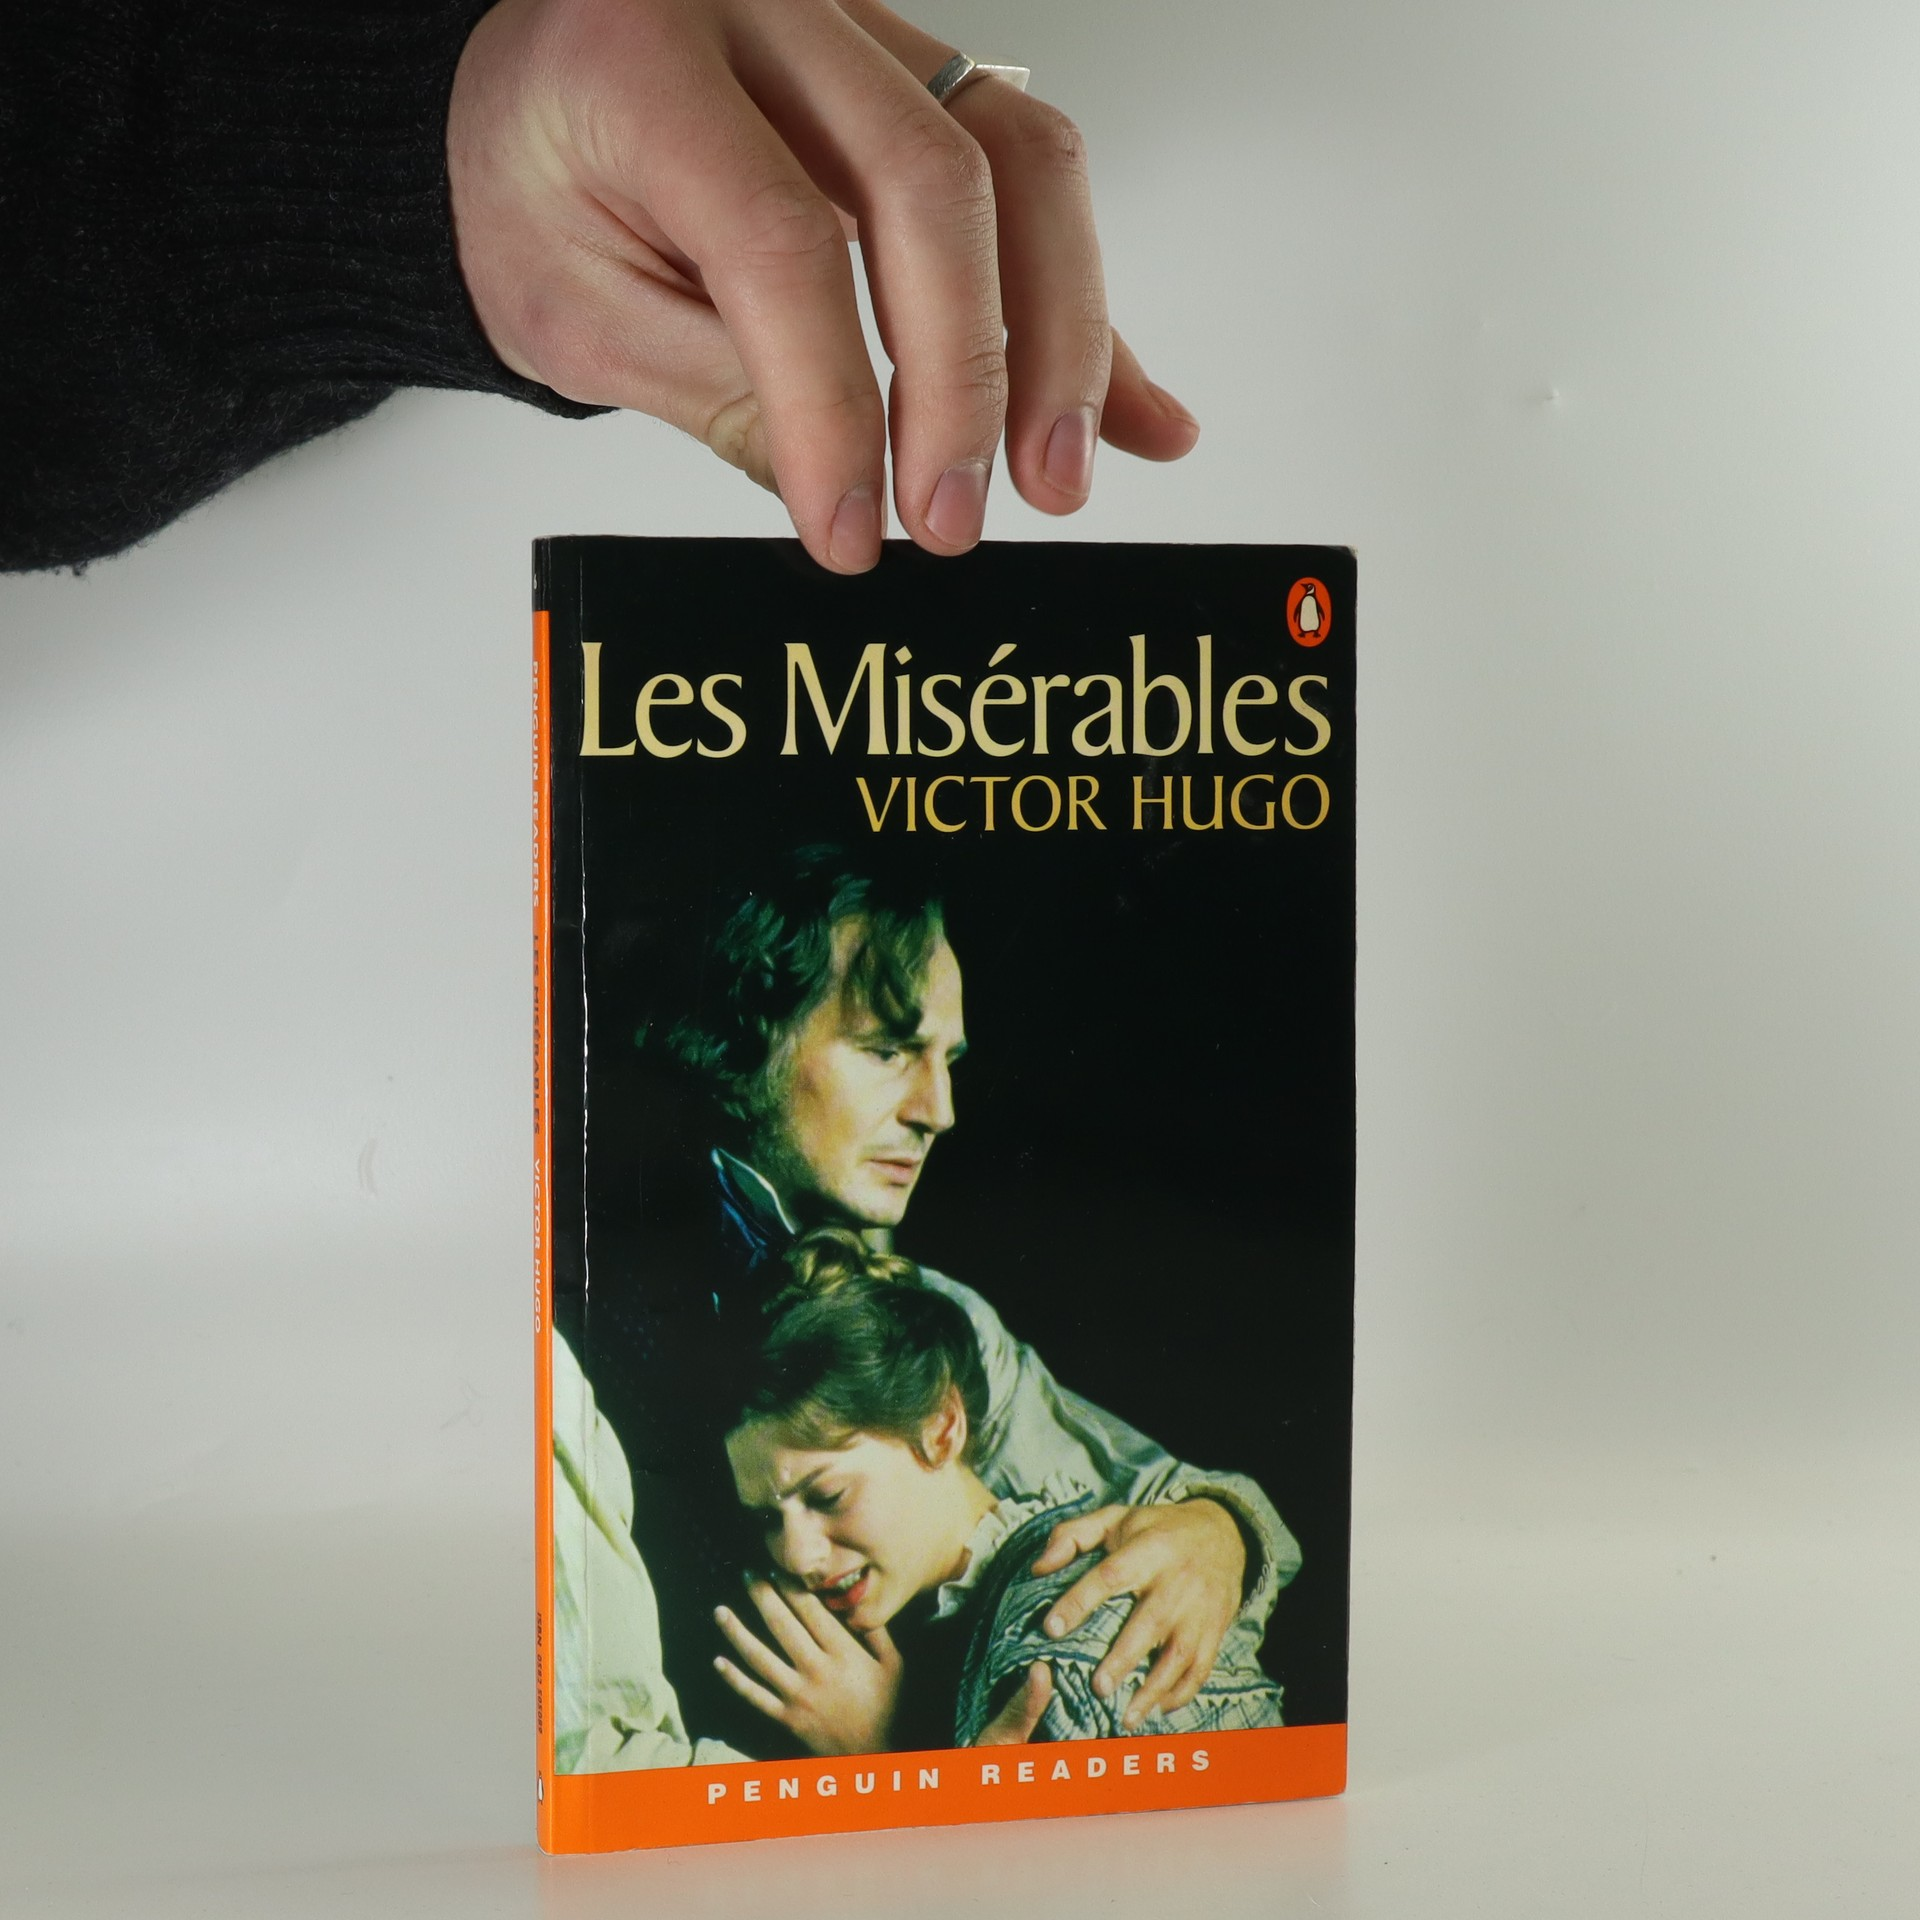 antikvární kniha Les misérables, 2002